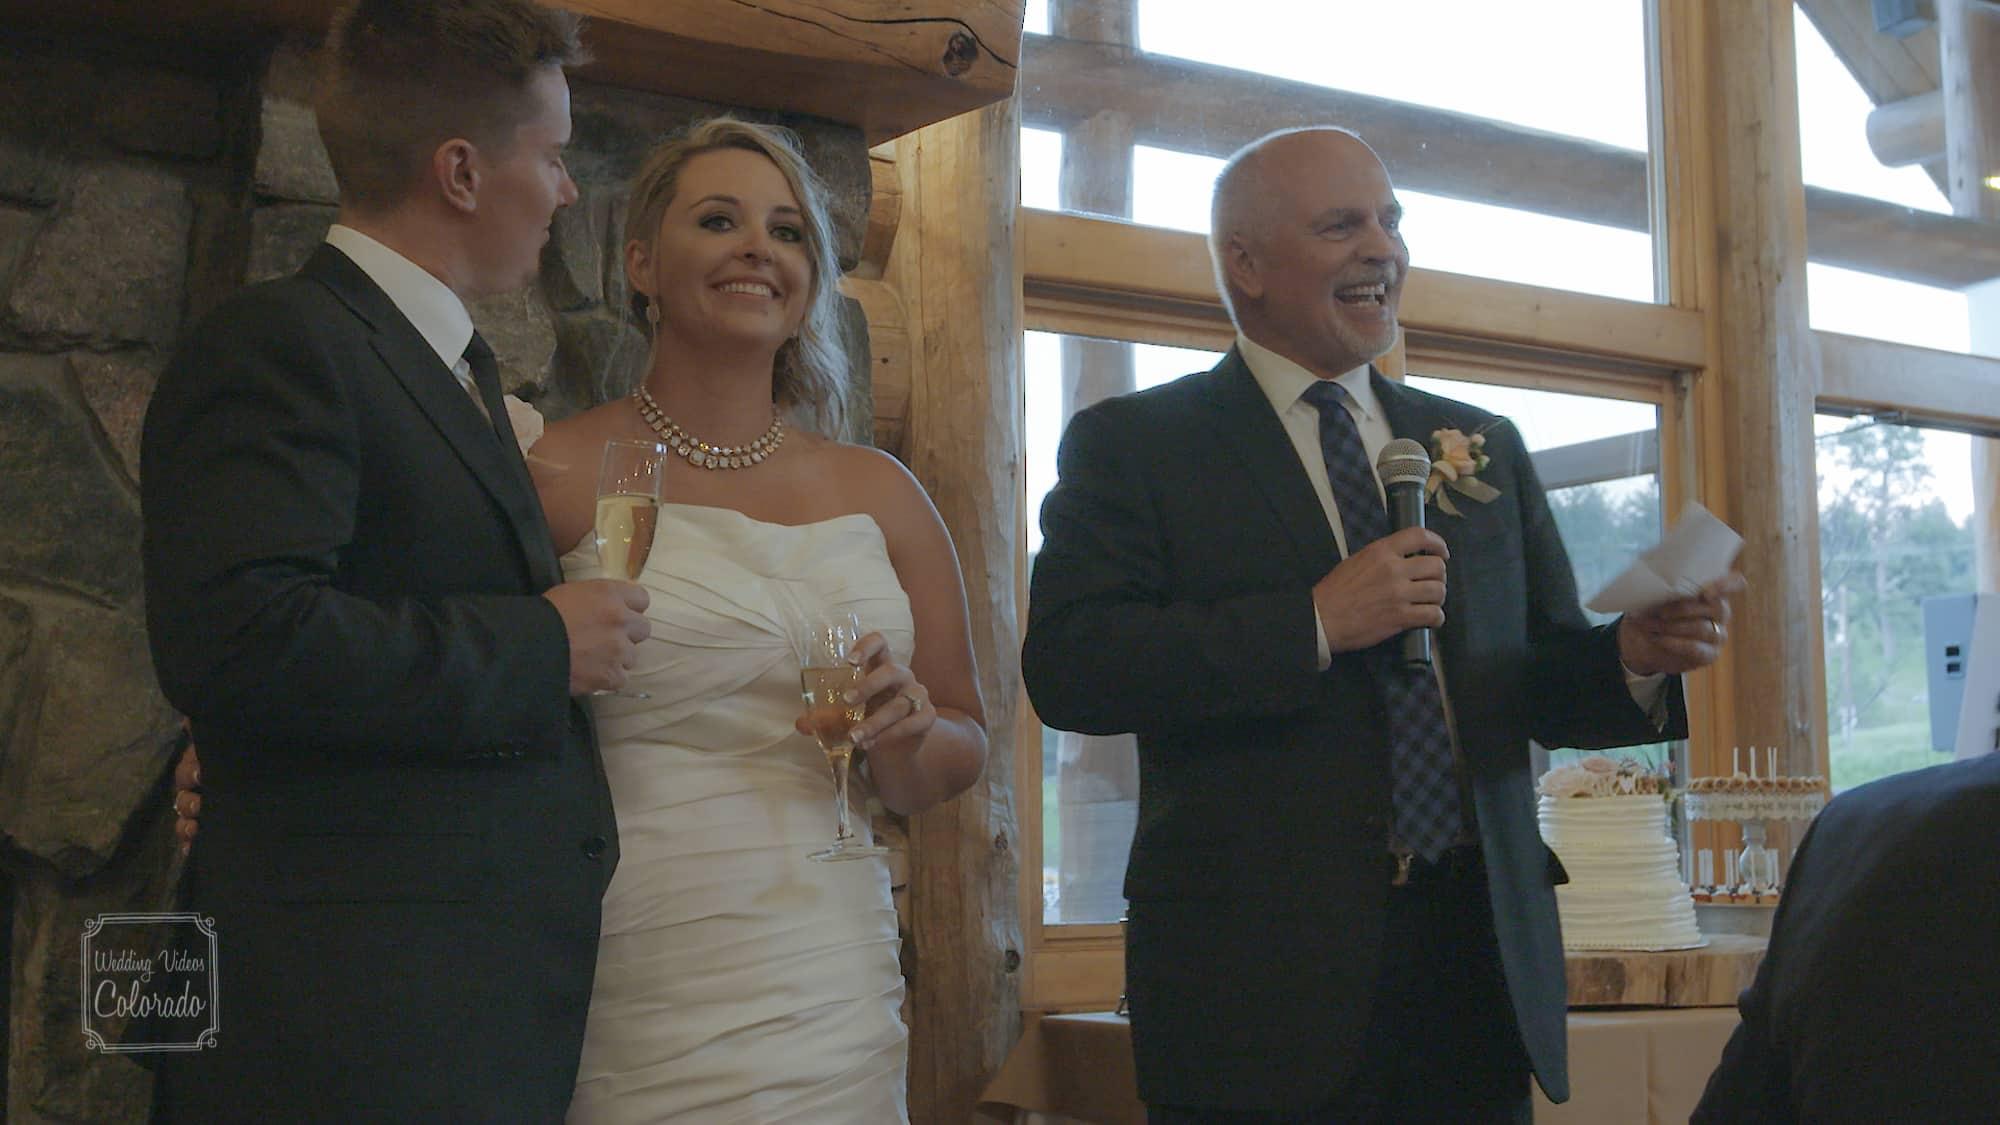 Lofing-Anderson Evergreen Wedding